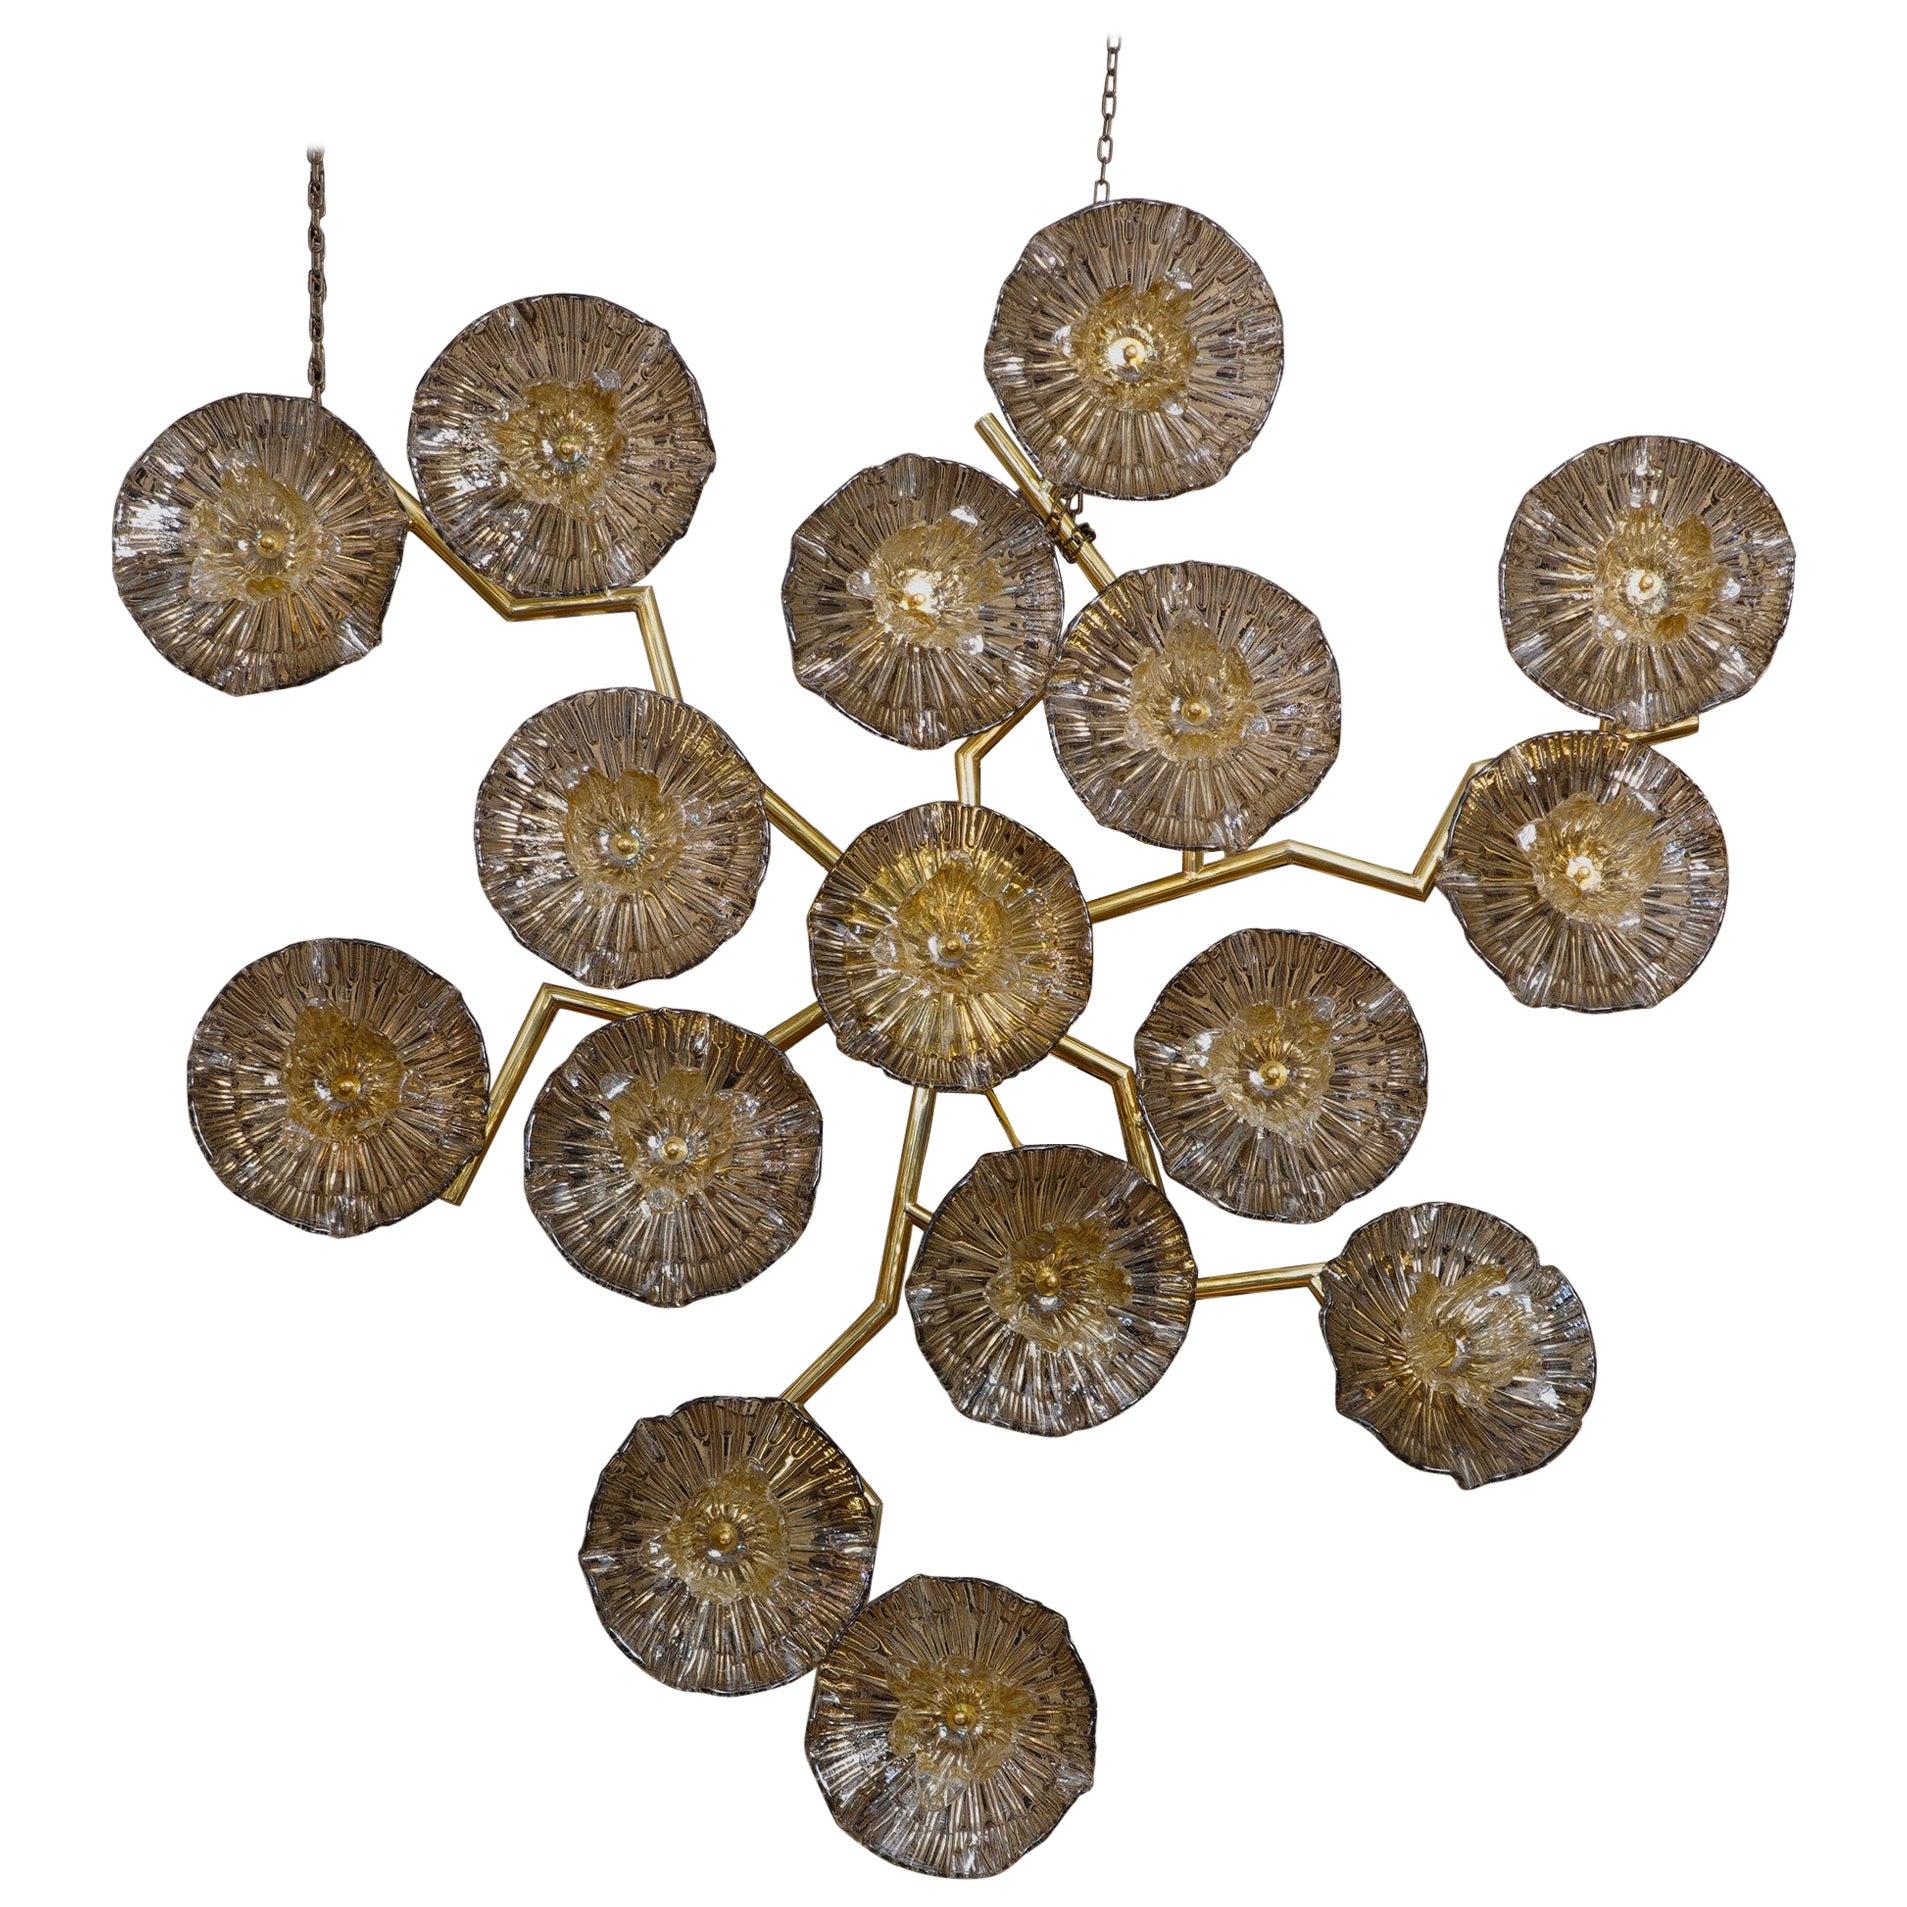 Murano Art Glass and Brass Midcentury Chandelier / Wall Light, 2010